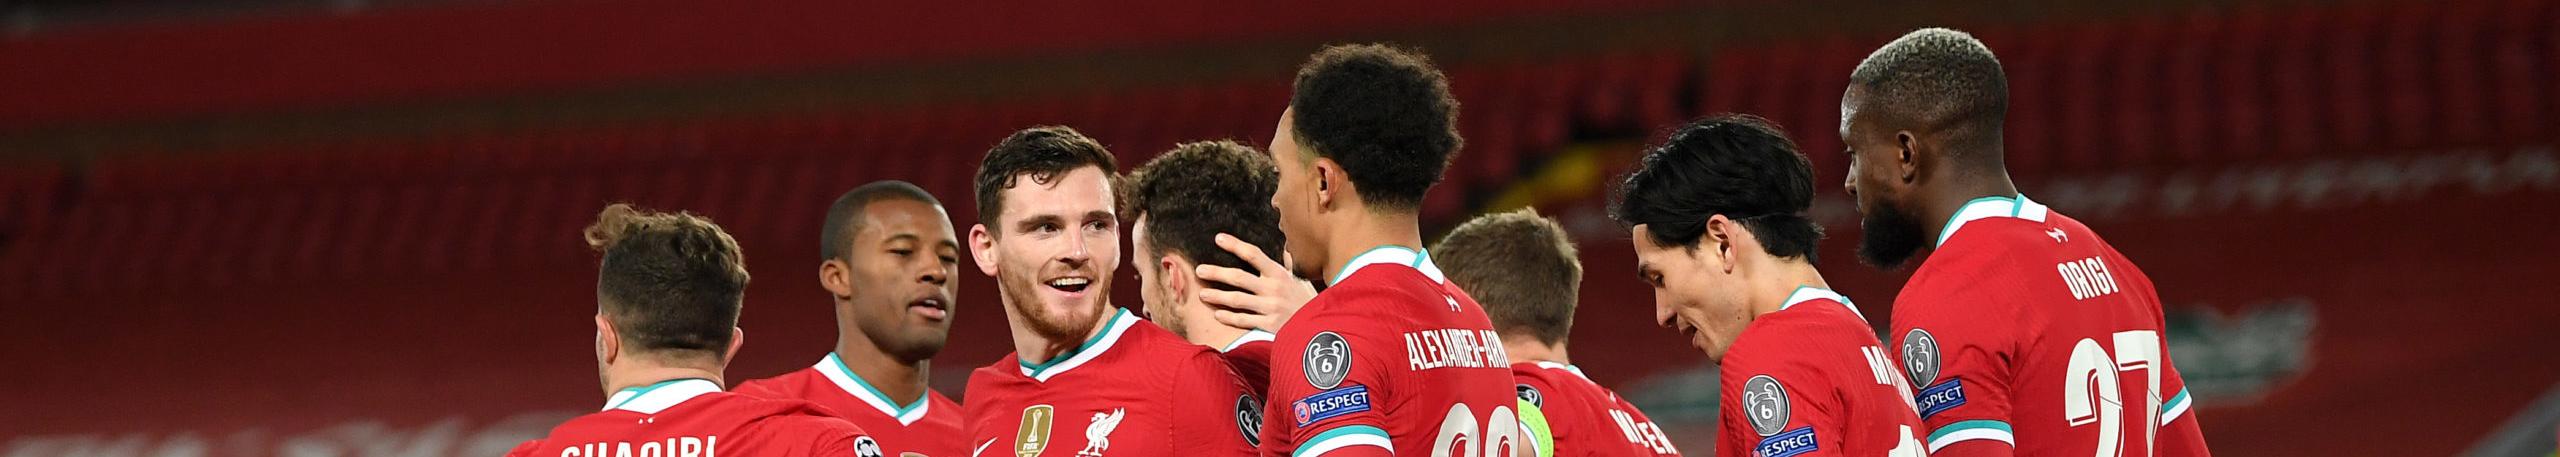 Liverpool-Leicester, scontro ad alta quota ad Anfield